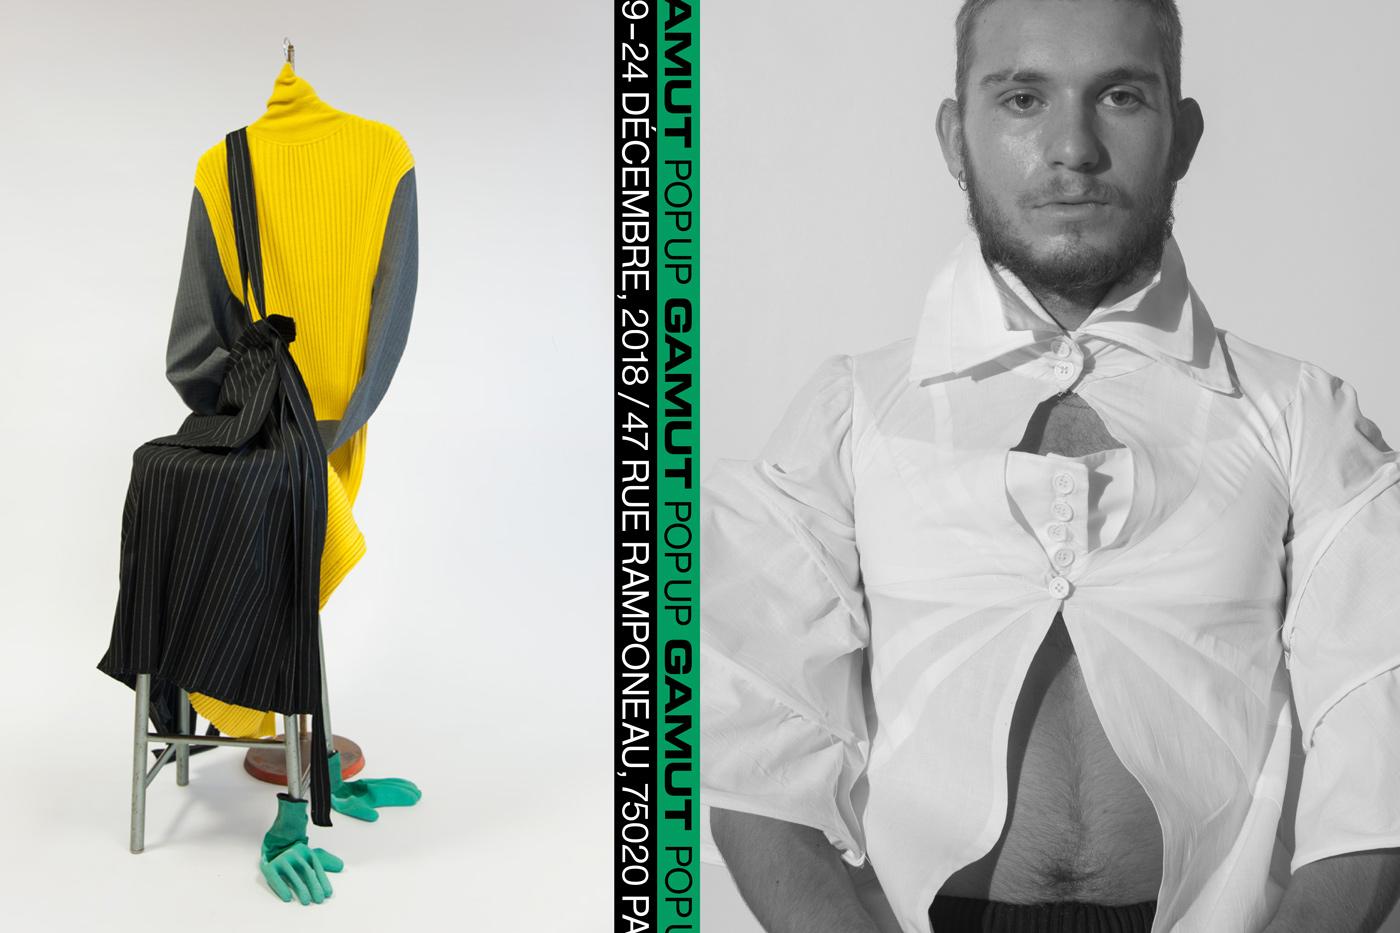 08 collide24 Europium - Europium's collaborative practice explores the relationship between photography and graphic design